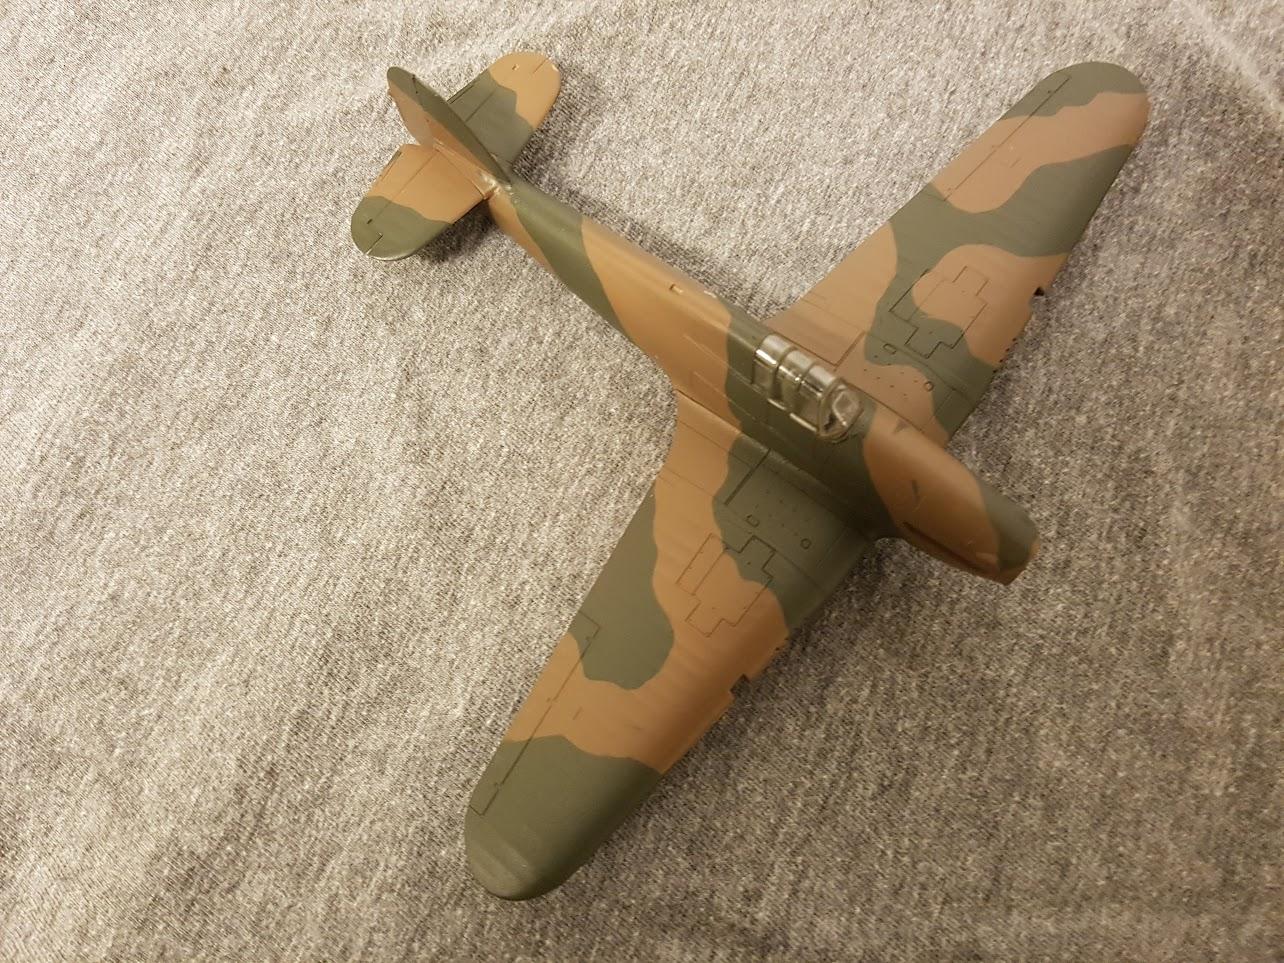 Hänger på med en Airfix 1/72 Hawker Hurricane Mk I - Sida 3 P_tlj3EXCS07kbRp6lPbqAhh_SLlbq6qTrNj6HtaypE44MtoIQ_Q7LVn8ahGvroU1ppNK2tW54c6yODiRuUoi2afQ1TDMQO0WFCIxk8hieGaTzJoNM7ahSS3JIqjvujvpPXN3VP_wpZhSRWW793RGnKJwuQD-x9Mv-QPdh-sa_-zIrpfqGqKkcC65quI1E5Plj1YiDkK8azDmSQnFk9STyR_M6-PYnge7sv0C23UDRZYfSPRMbGZA-kpyc74ORMEbNuSMdxmptN53W2IcWOI16kUM9_XReoowATx5zgnq2Ctn6dp-rCWCoMyE9BeJymPTYP0Ml0Oq-QCswbdWUh3E680007HnAuPFWX9HQbx3ki6C3Se-XXzGreLOUhKIovfNz3eWB98zOBgCoVWpHoGMYCOmU-zddJKbX-pSNL9EiYklSGhWEq2UMRcWx5nn28E4NzA4fNIt_0VNo92yvLzEyFBczFa7NjIuXbkIHM0VPhN5f0ICiSrehDNWHWLpwqwAoMZH0iKuLA3vRKY3sR0QSXrC4rFFnU0jrrZN3FdK4bEo9fwCE_Gf4vkx3tpWt96GdZIMRVw0J27CIWdfGCDFtW19q2y0Wcp6yRSajUp0w=w1284-h963-no